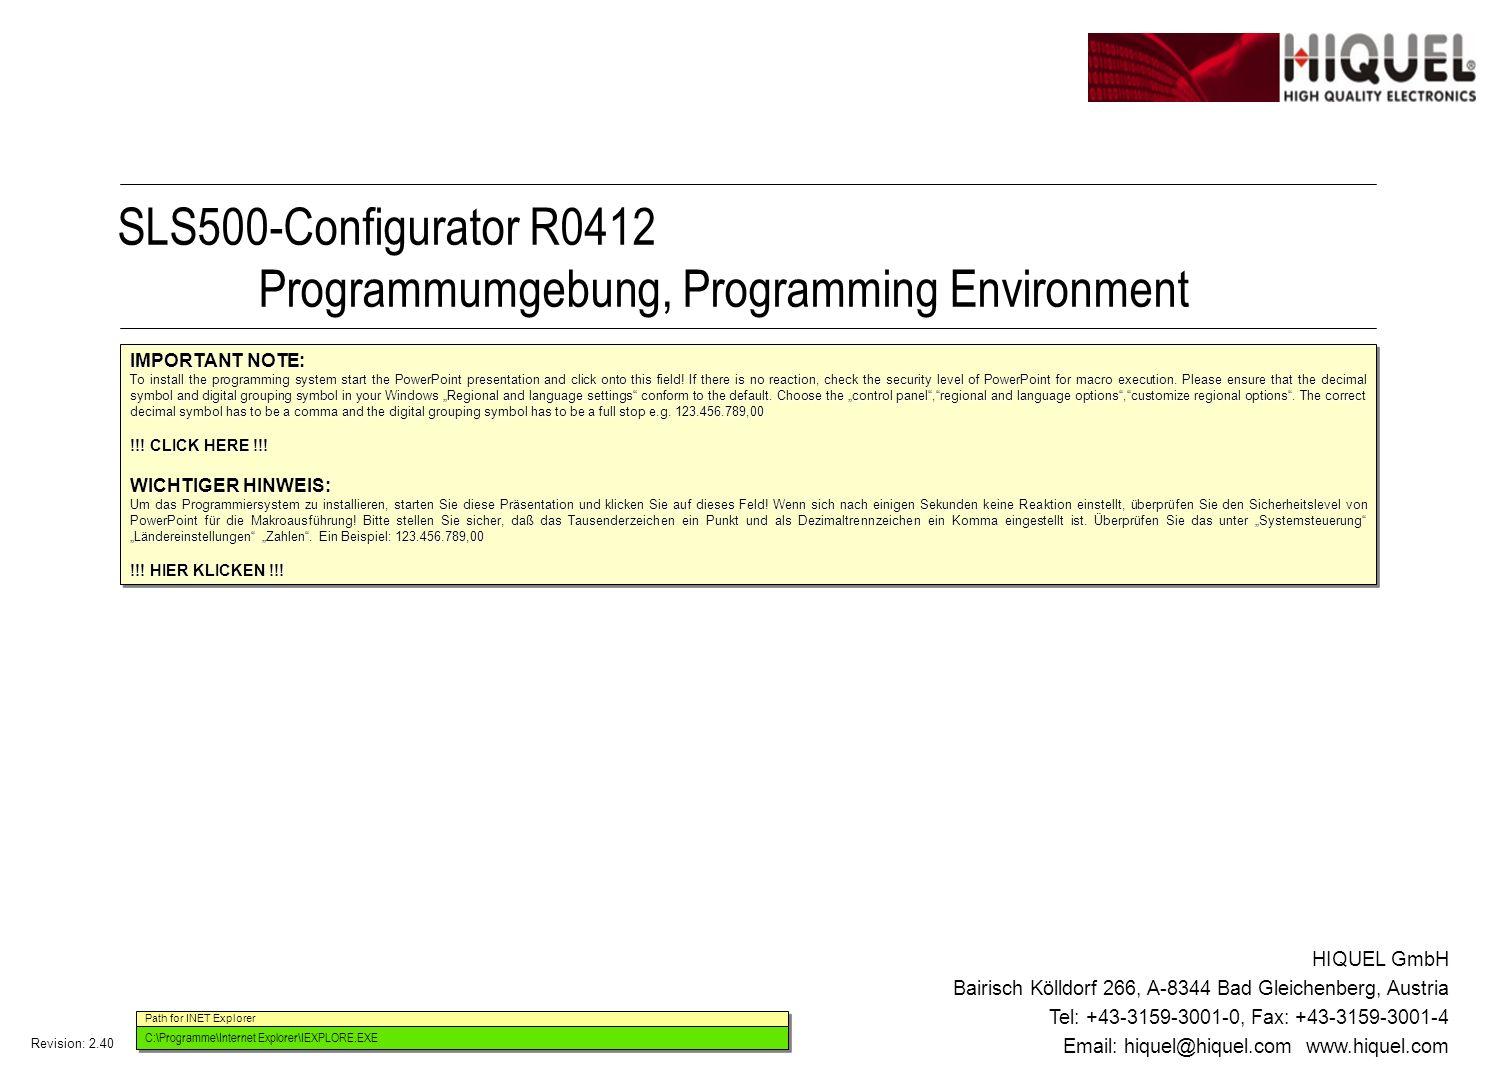 Revision: 2.40 Page 2 Title: Configuration My Configuration DI1: DI2: DI3: DI4: DI5: DI6: DI7: DI8: DO1: DO2: DO3: DO4: DO5: DO6: AI1: AI2: AI3: AI4: POTI1: POTI2: SLS500-RHIQUEL-TERM4